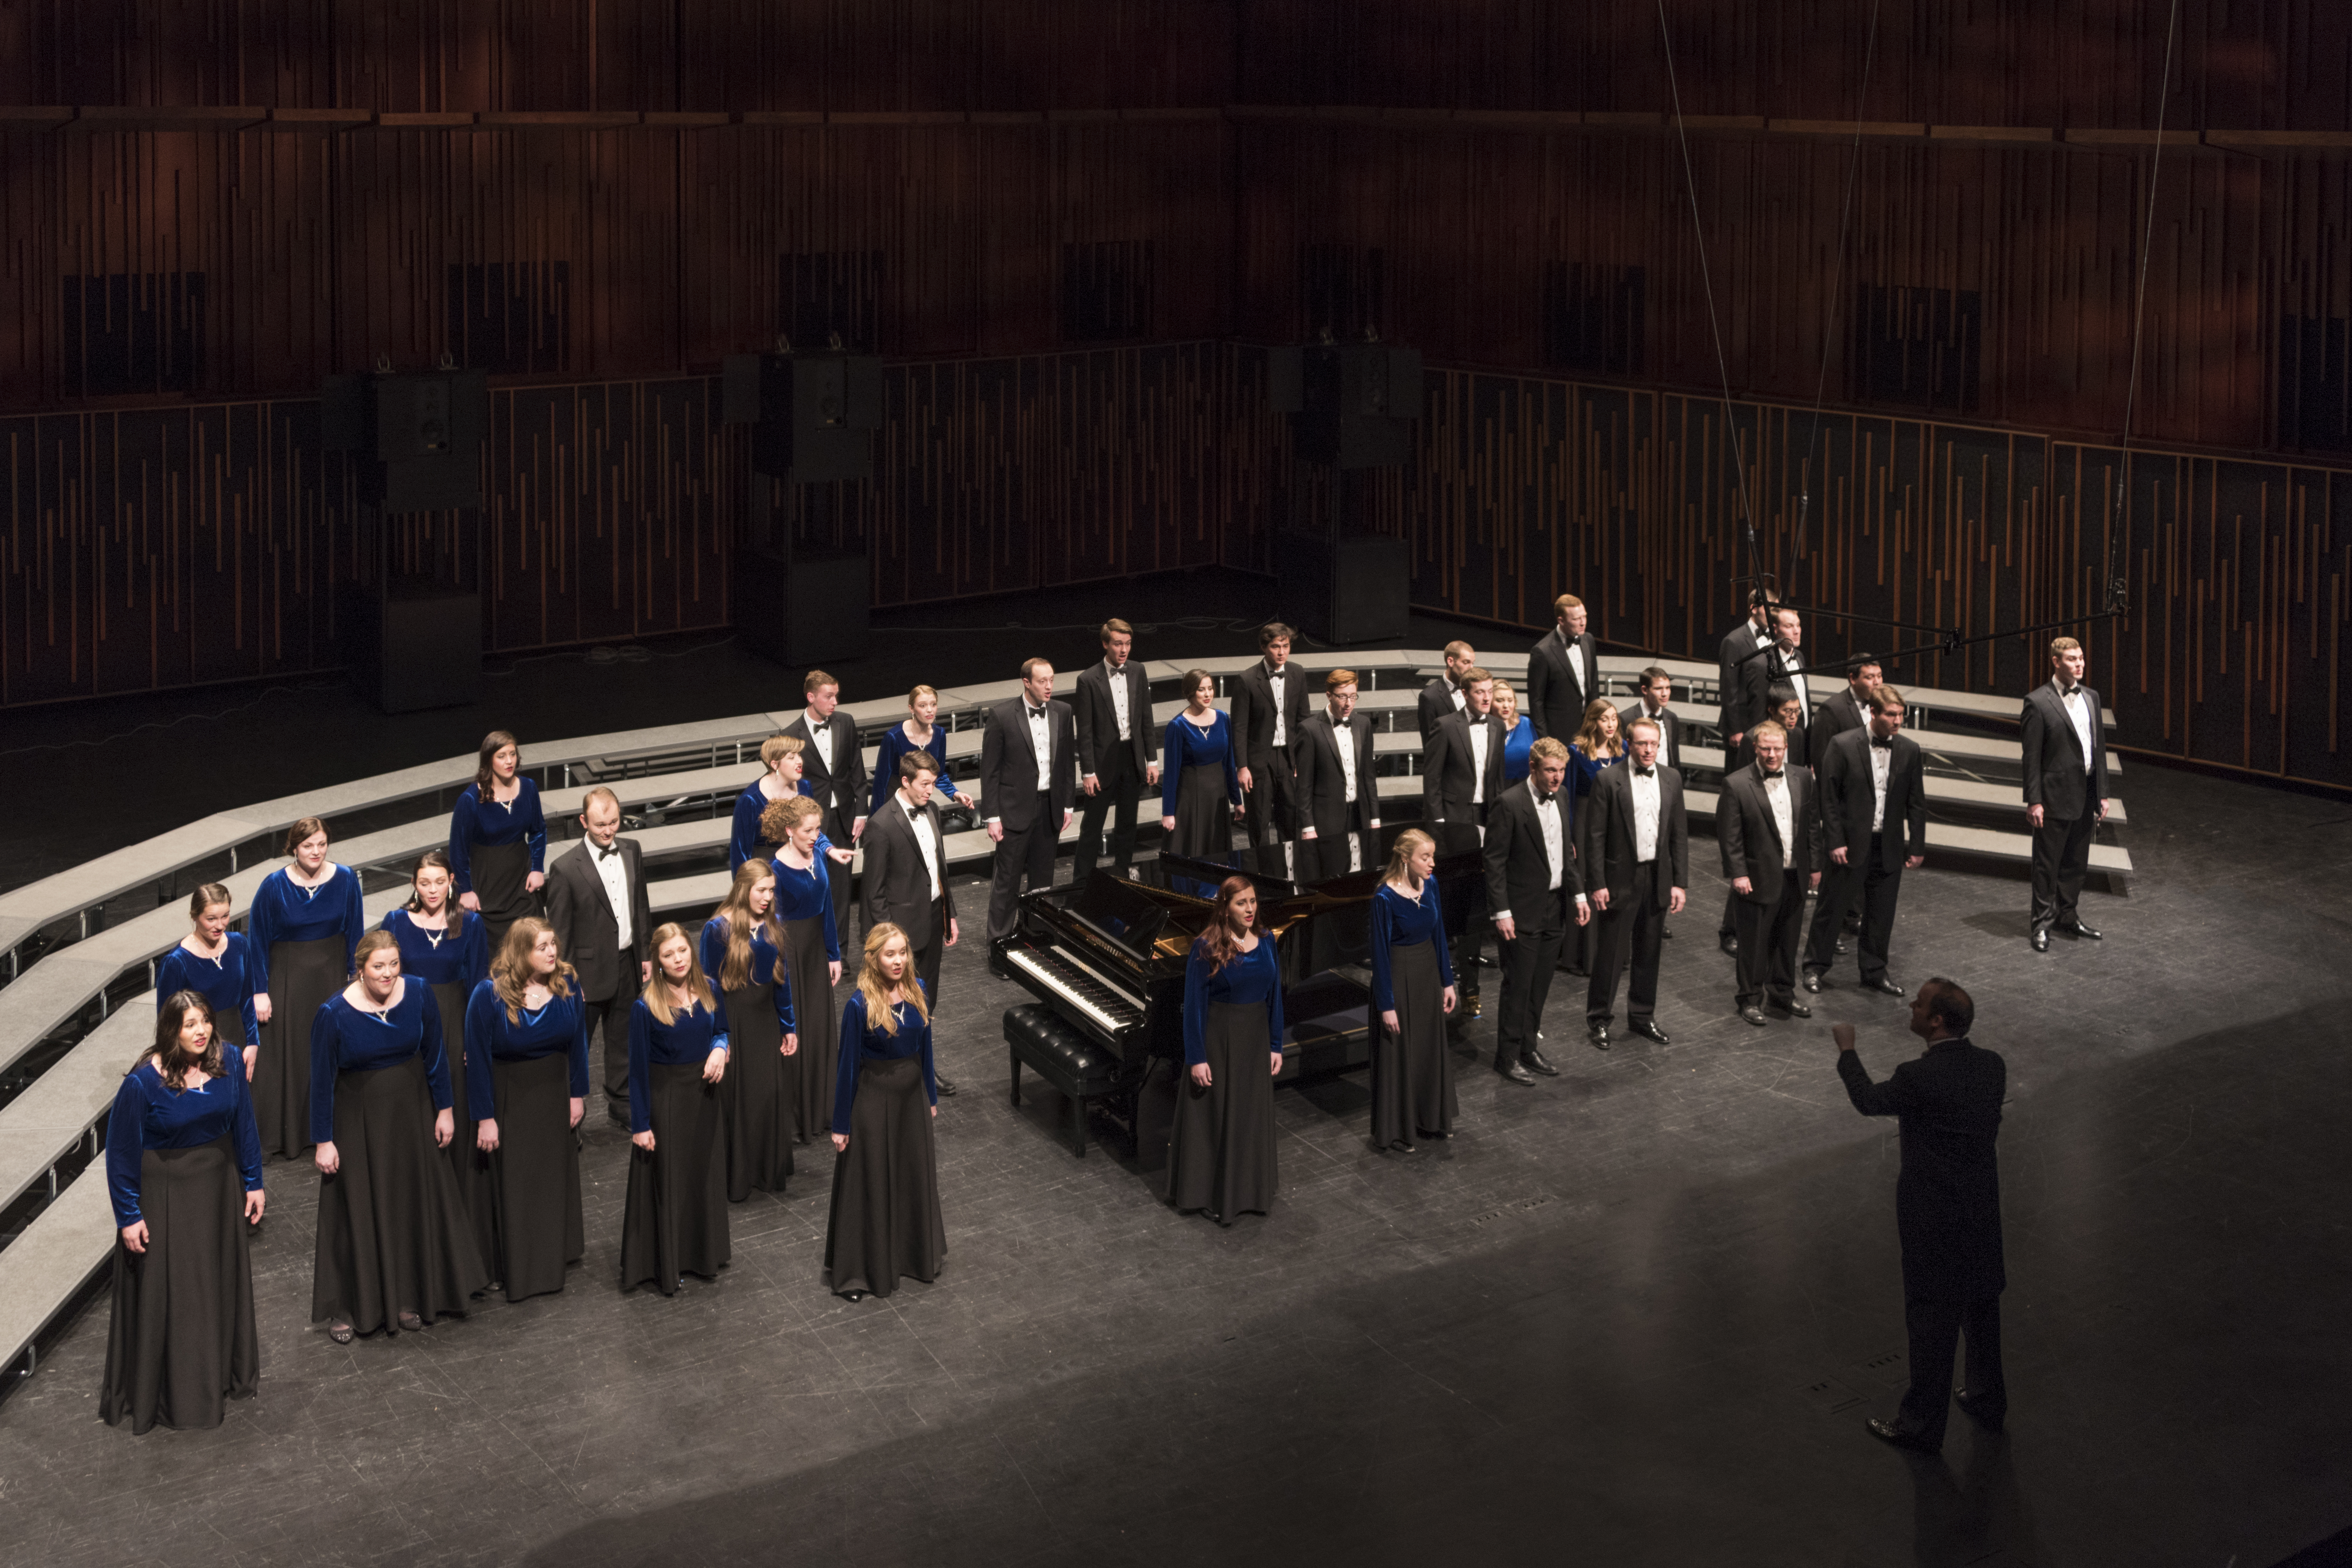 BYU Singers during their 2017 Winter Choirfest at BYU de Jong Concert Hall. Photo by Sandefur Schmidt.